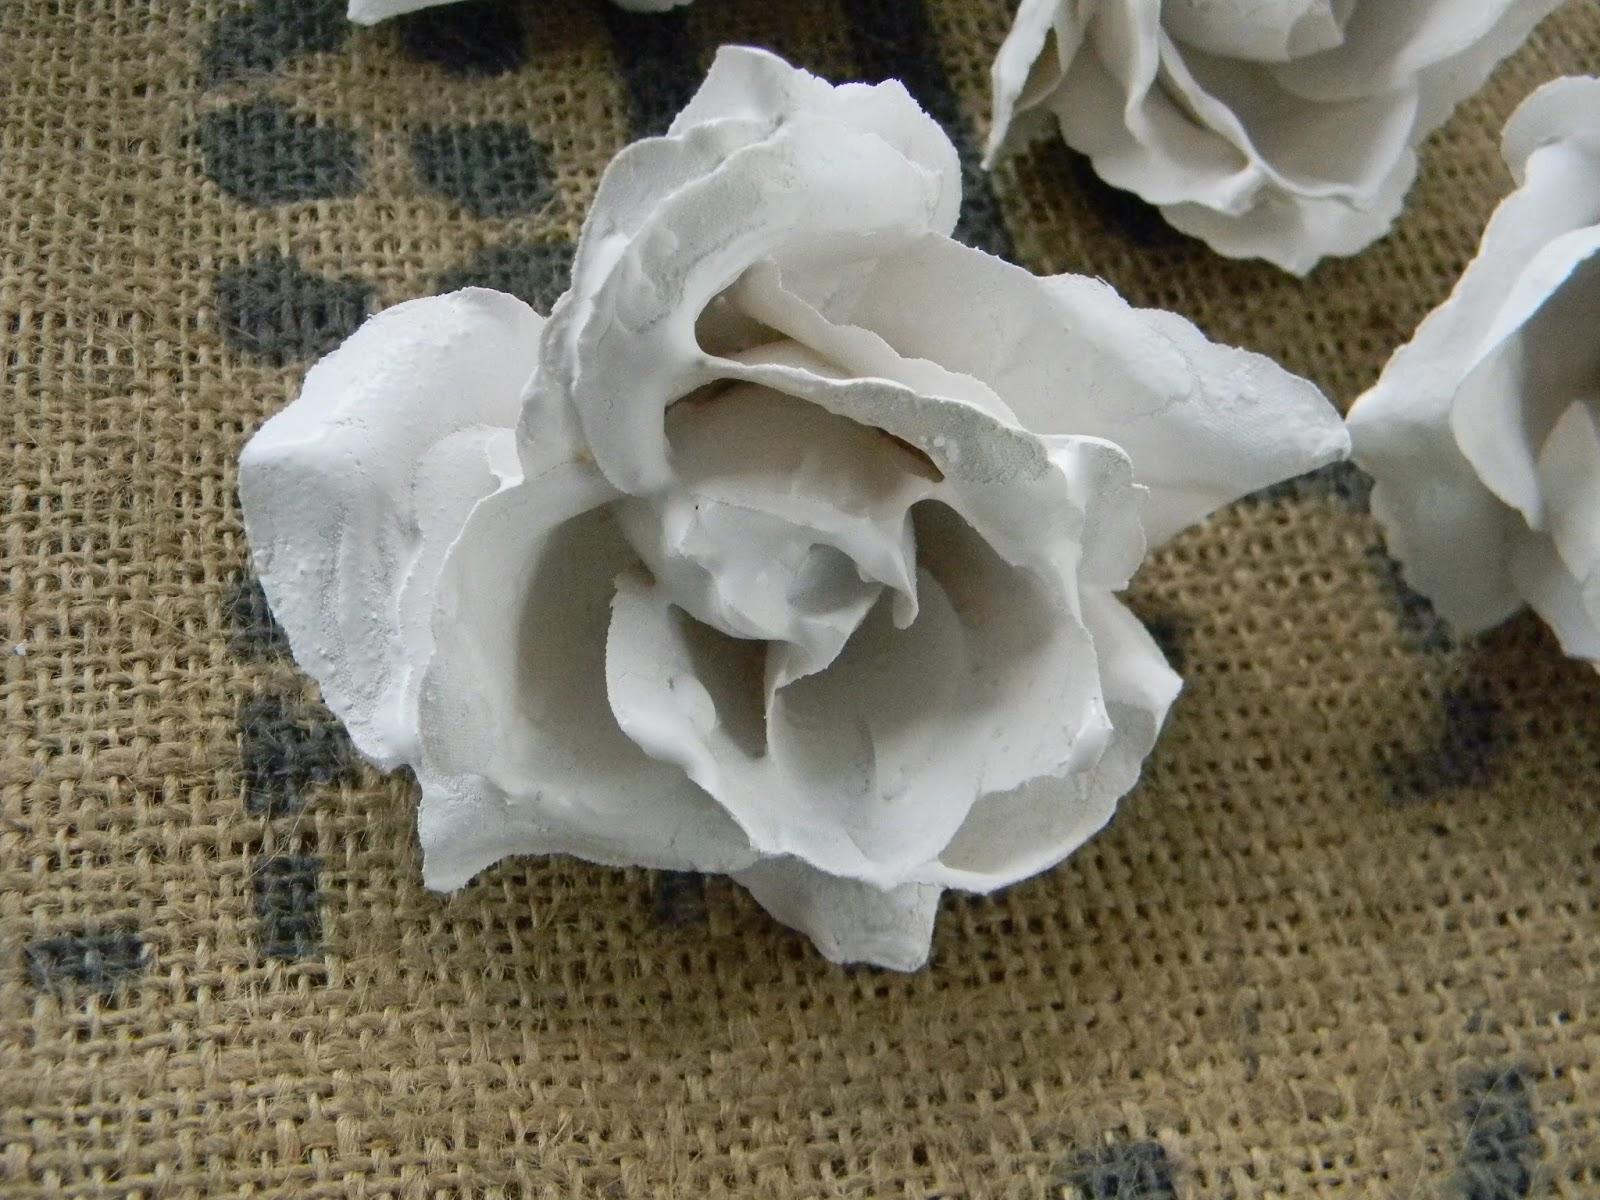 Artistic endeavors 101 plaster dipped silk flowers plaster dipped silk flowers mightylinksfo